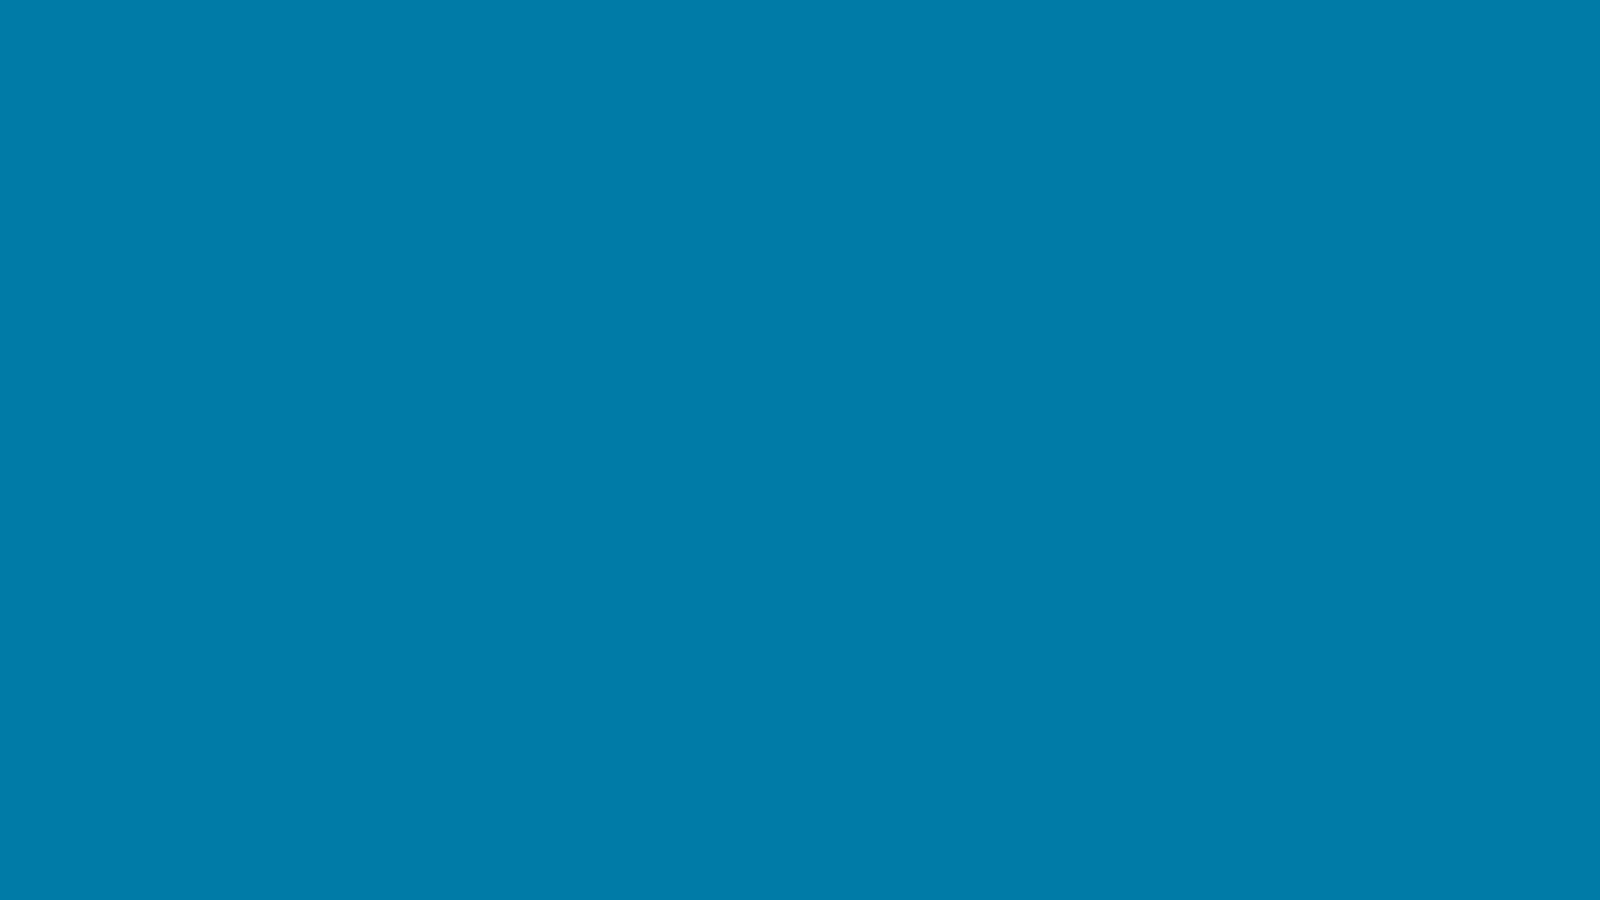 1600x900 Celadon Blue Solid Color Background